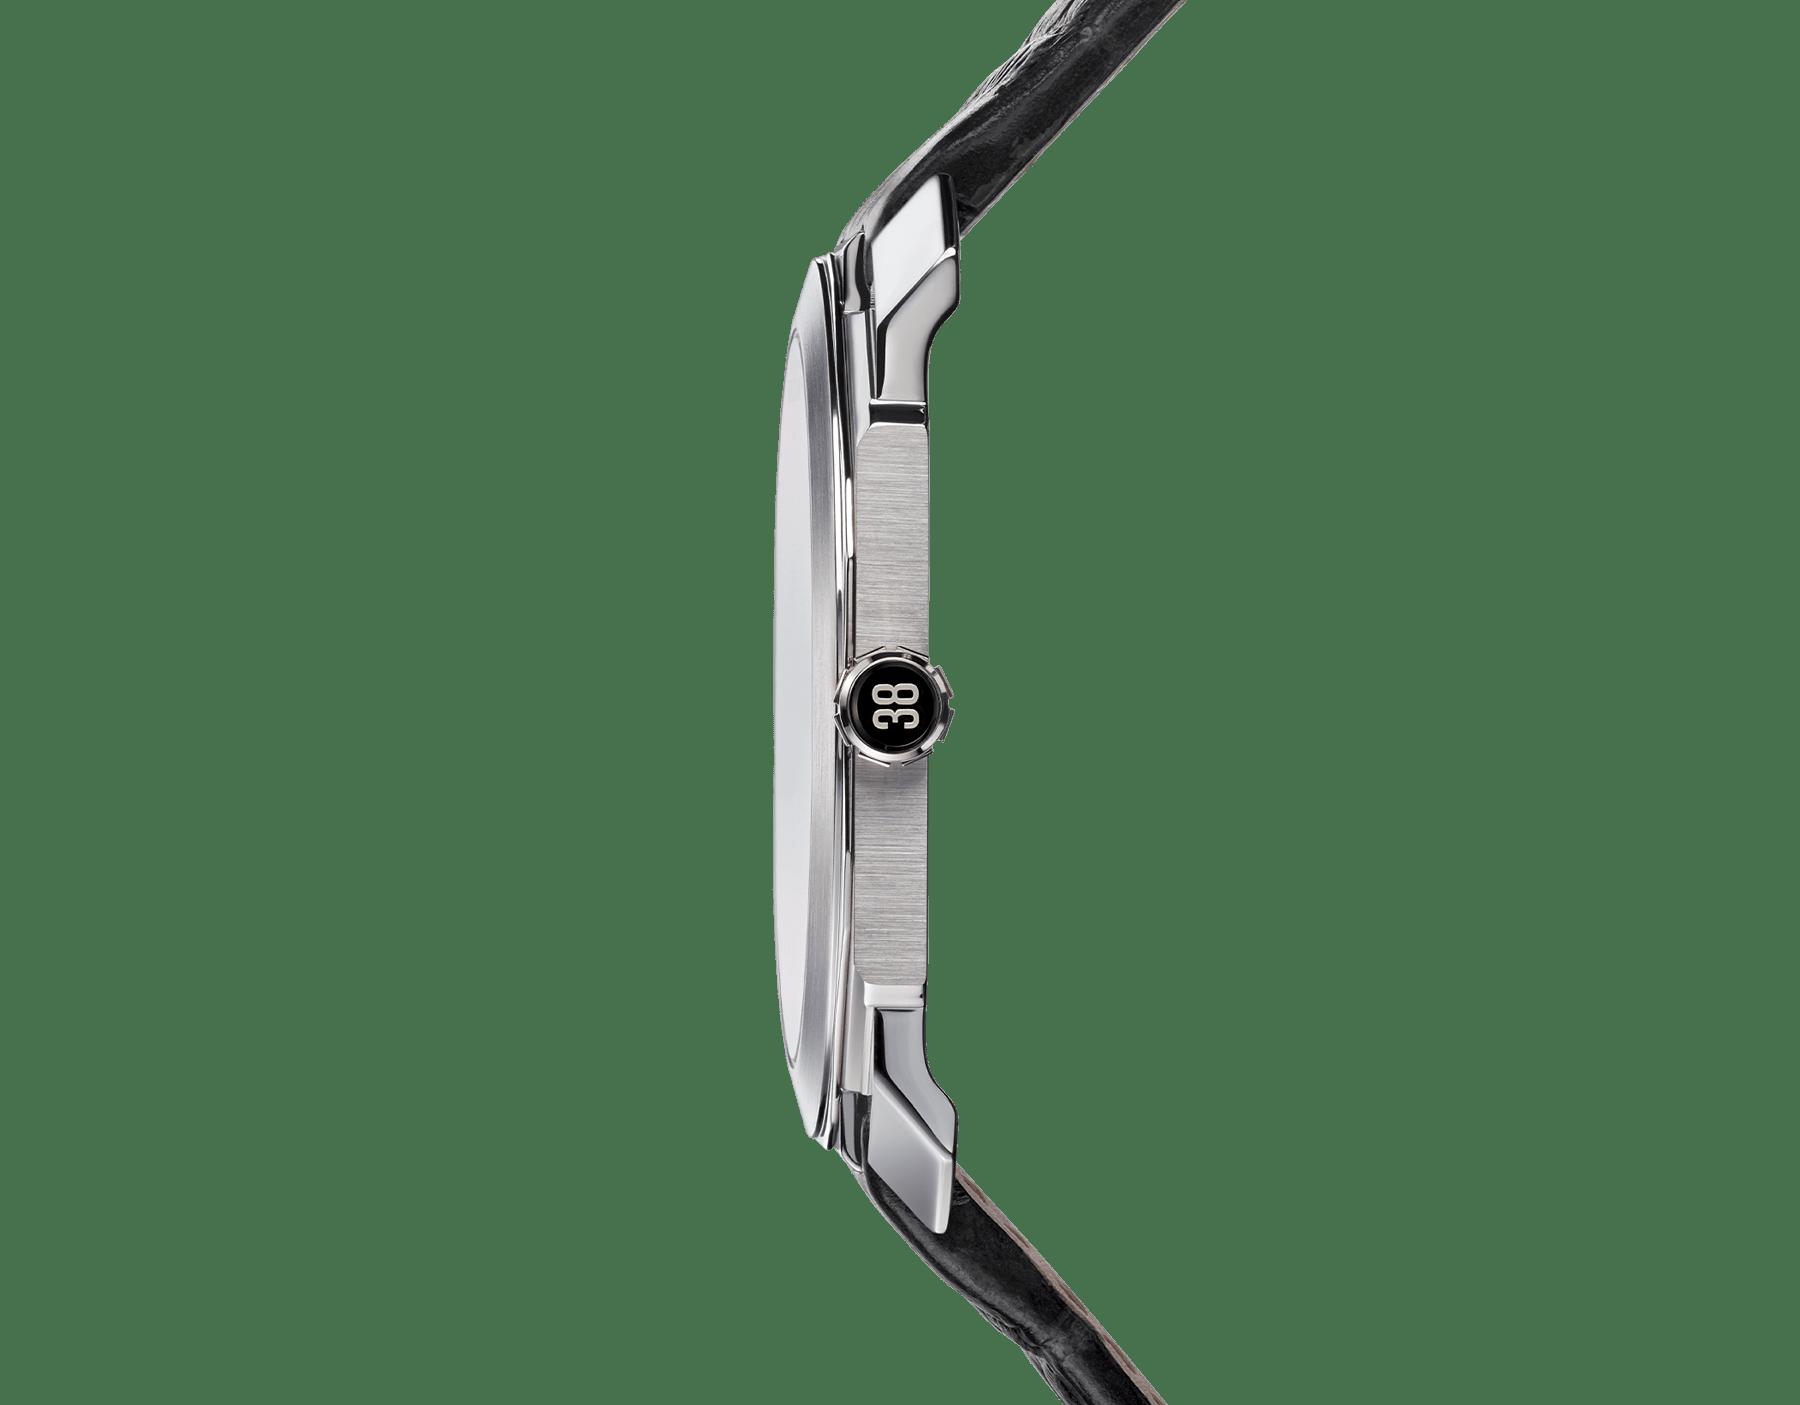 Octo Finissimo Tourbillon Squelette 腕錶搭載超薄鏤空機械機芯,手動上鍊,滾珠軸承系統,鉑金錶殼,透明錶盤,黑色鱷魚皮錶帶。 102719 image 3